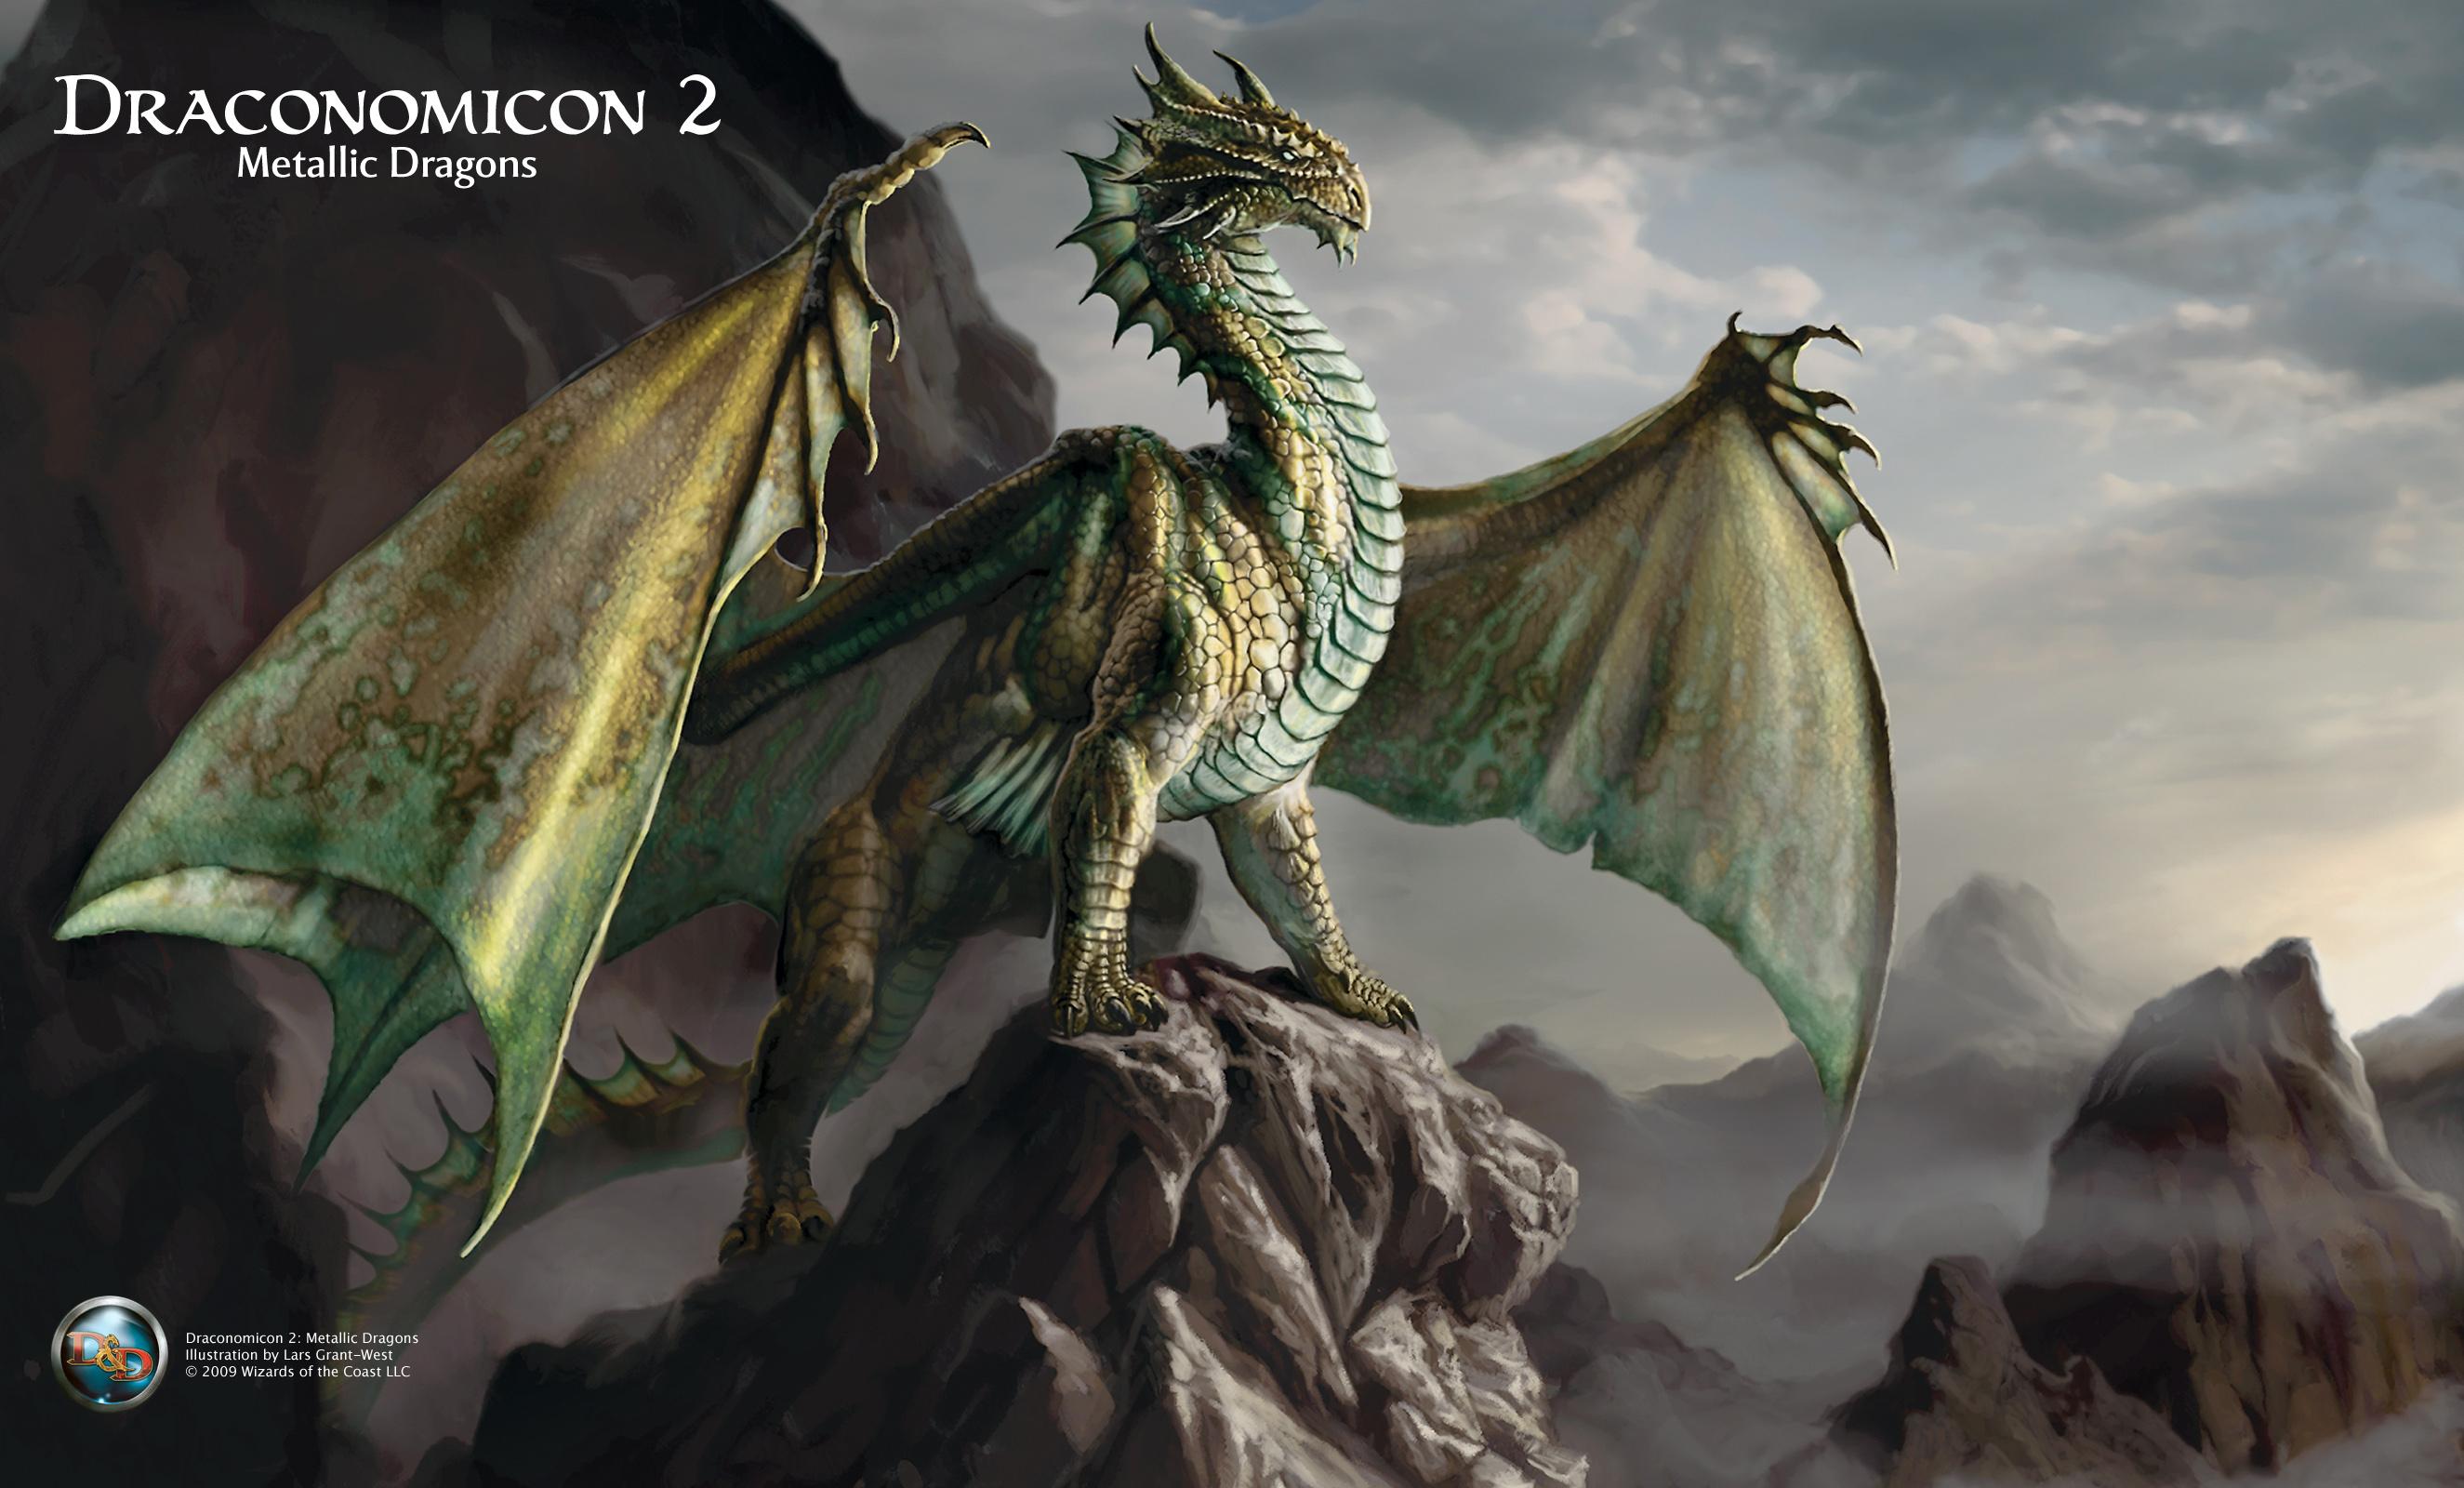 Dragonomicon Metalic Dragons  Dragon